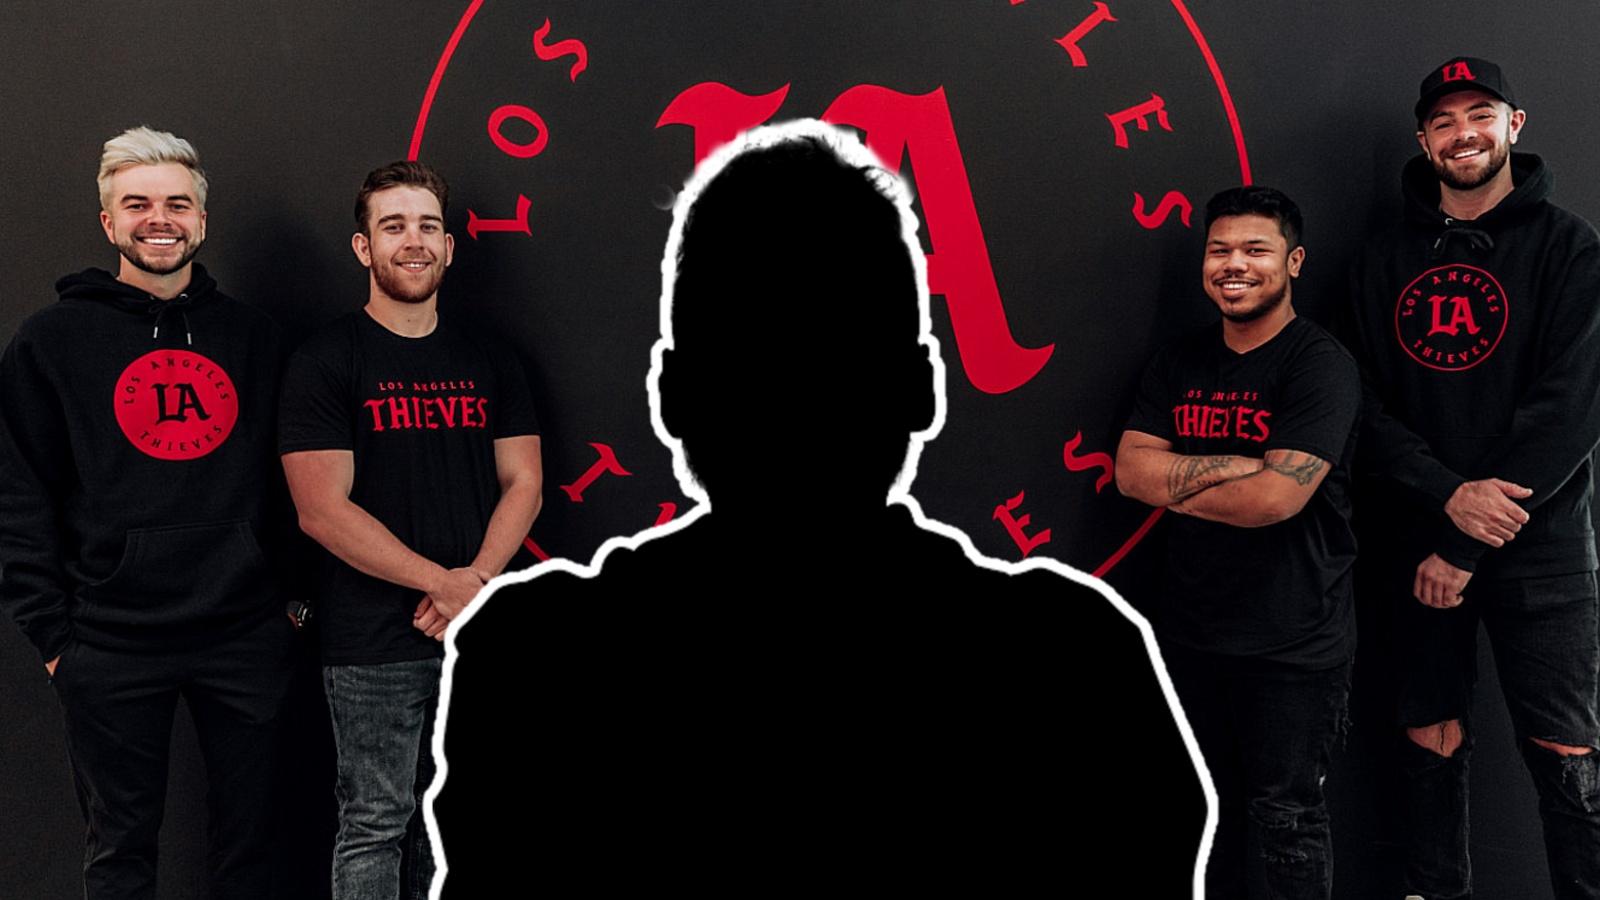 la thieves final roster spot